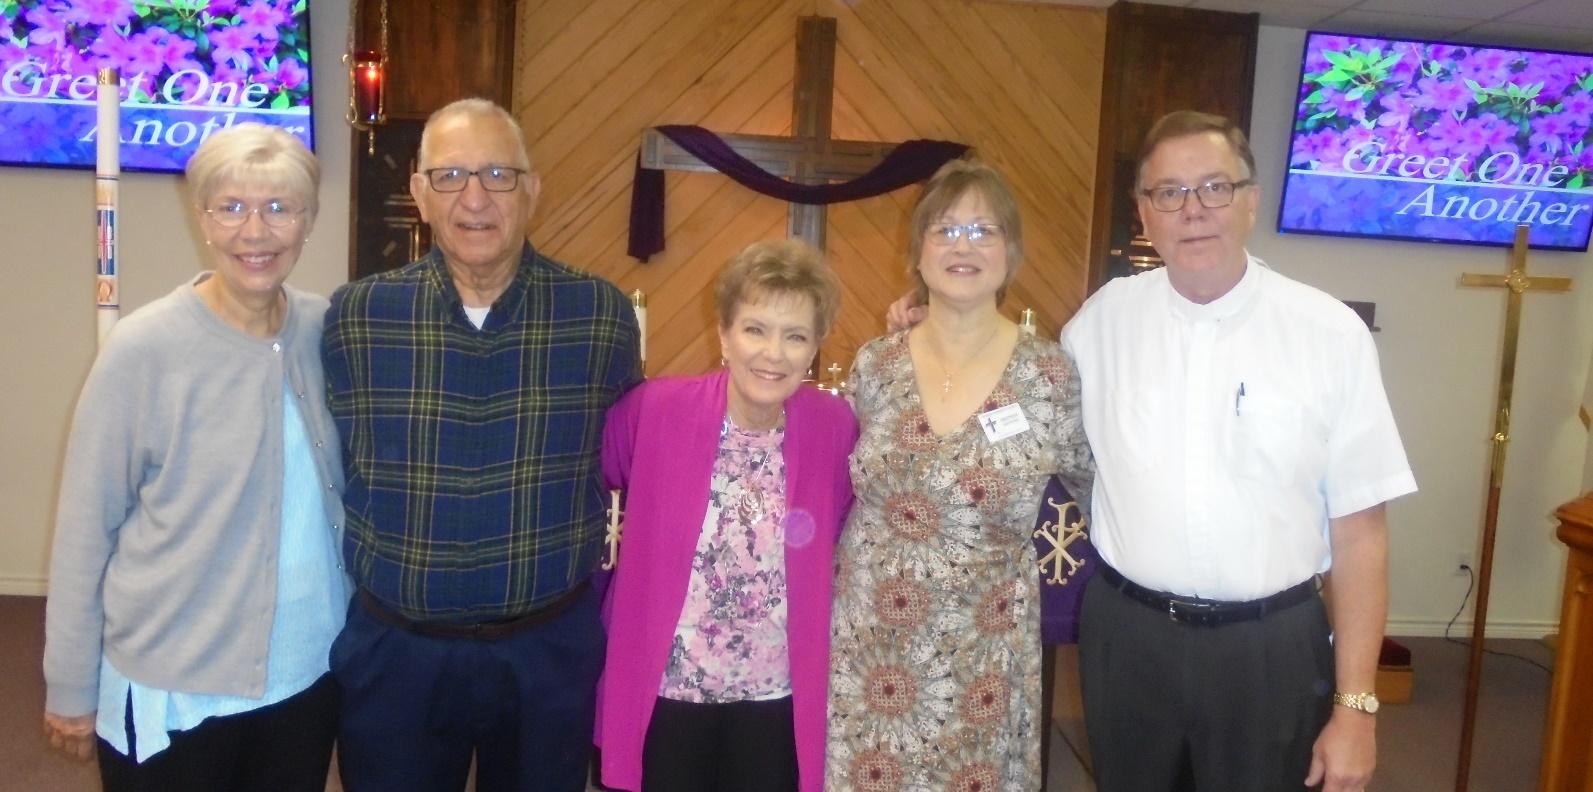 Our Stephen Minstry Team at Genesis. Carol Carlos, Joe Carlos, Carol Doyal, Brenda Rienstra and Pastor Trey Rienstra.